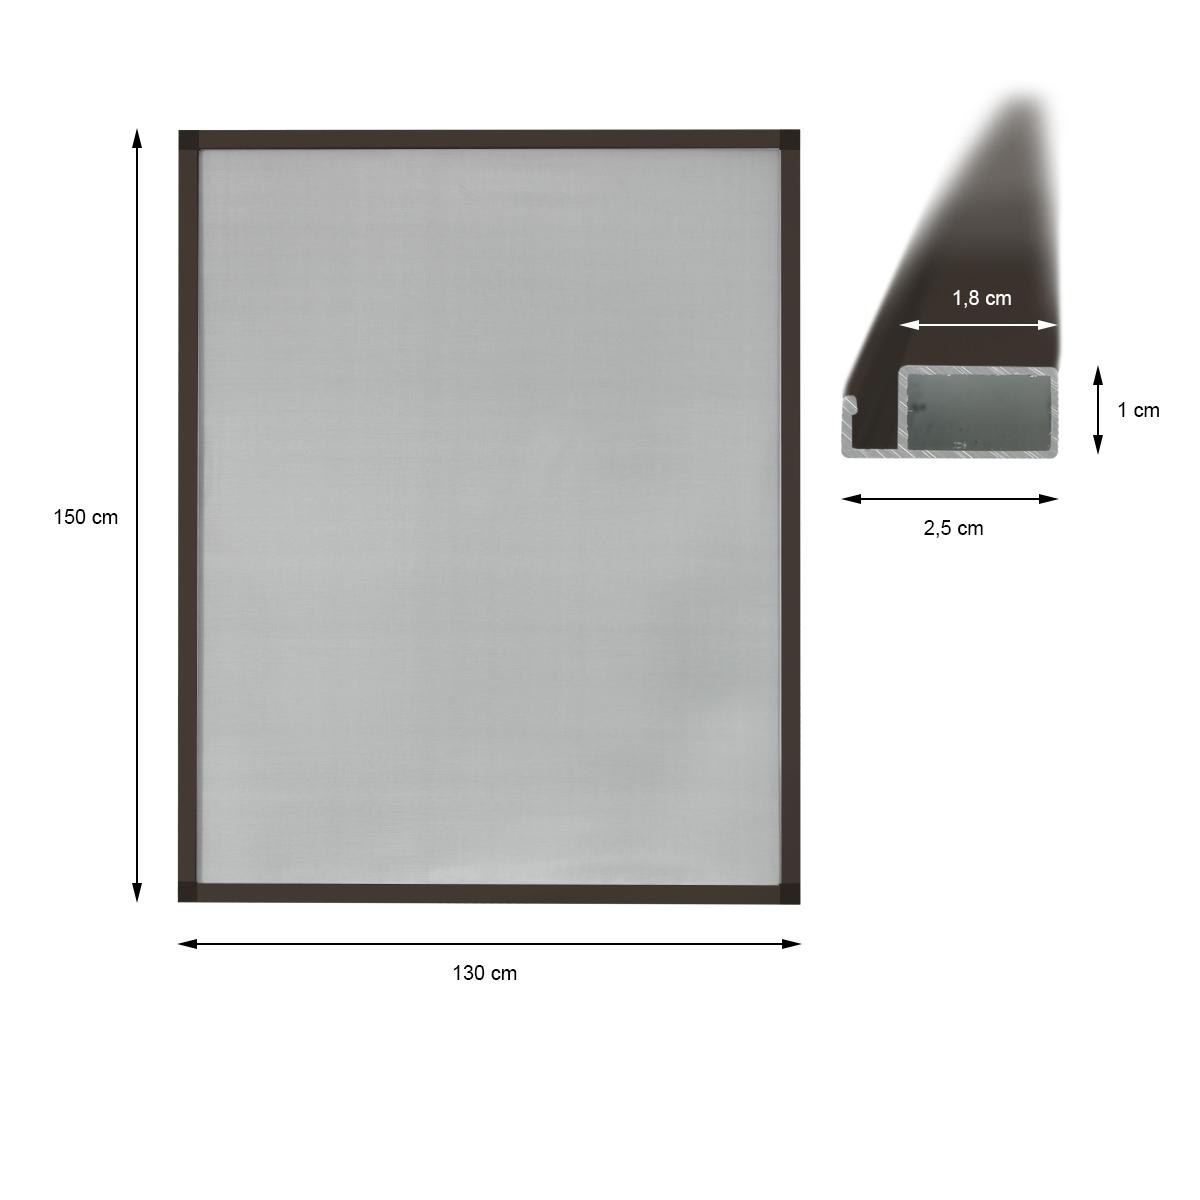 fen tres anti insectes moustiquaire cadre a choisir en aluminium marron blanc ebay. Black Bedroom Furniture Sets. Home Design Ideas